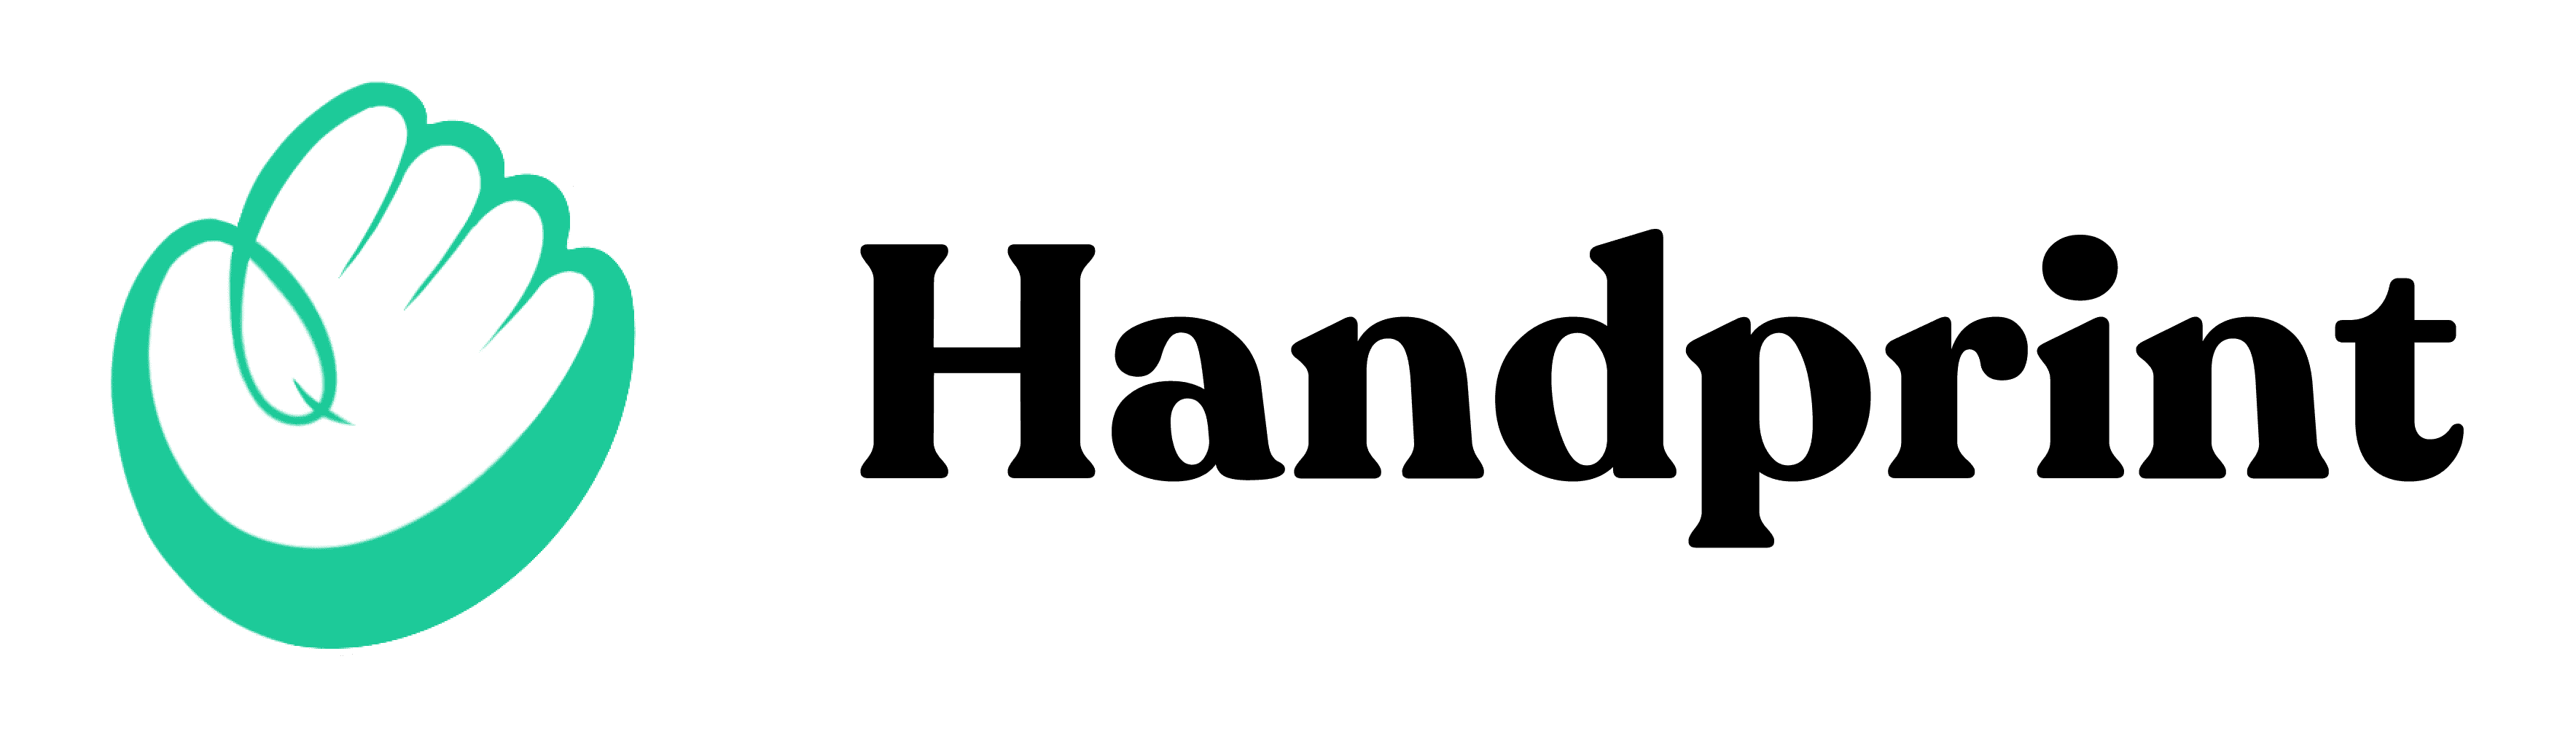 Handprint - Crunchbase Company Profile & Funding